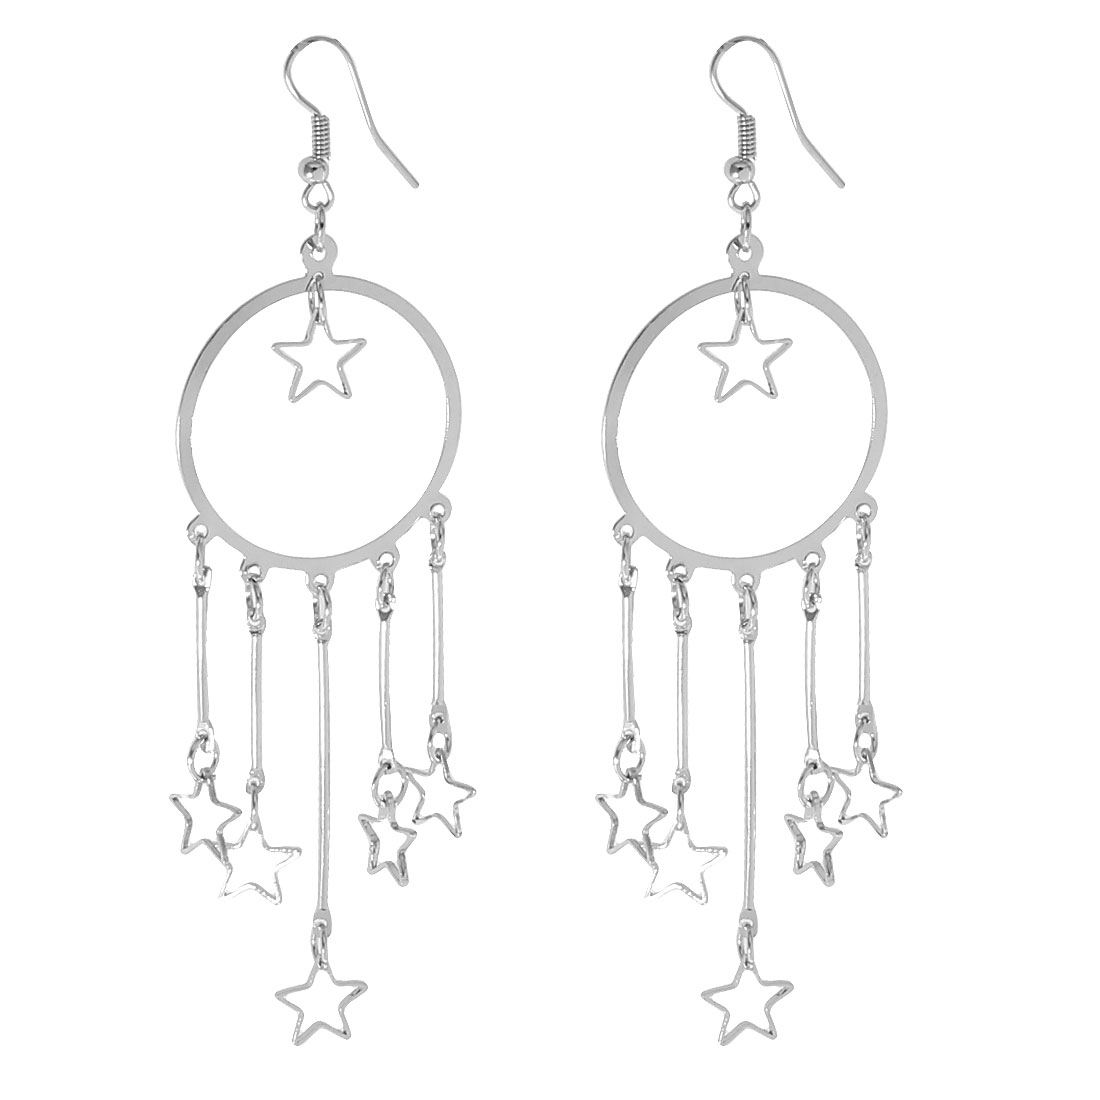 "Sliver Tone Metal Pentagrams Circle Dangling Hook Earrings 4.1"" Long Pair"